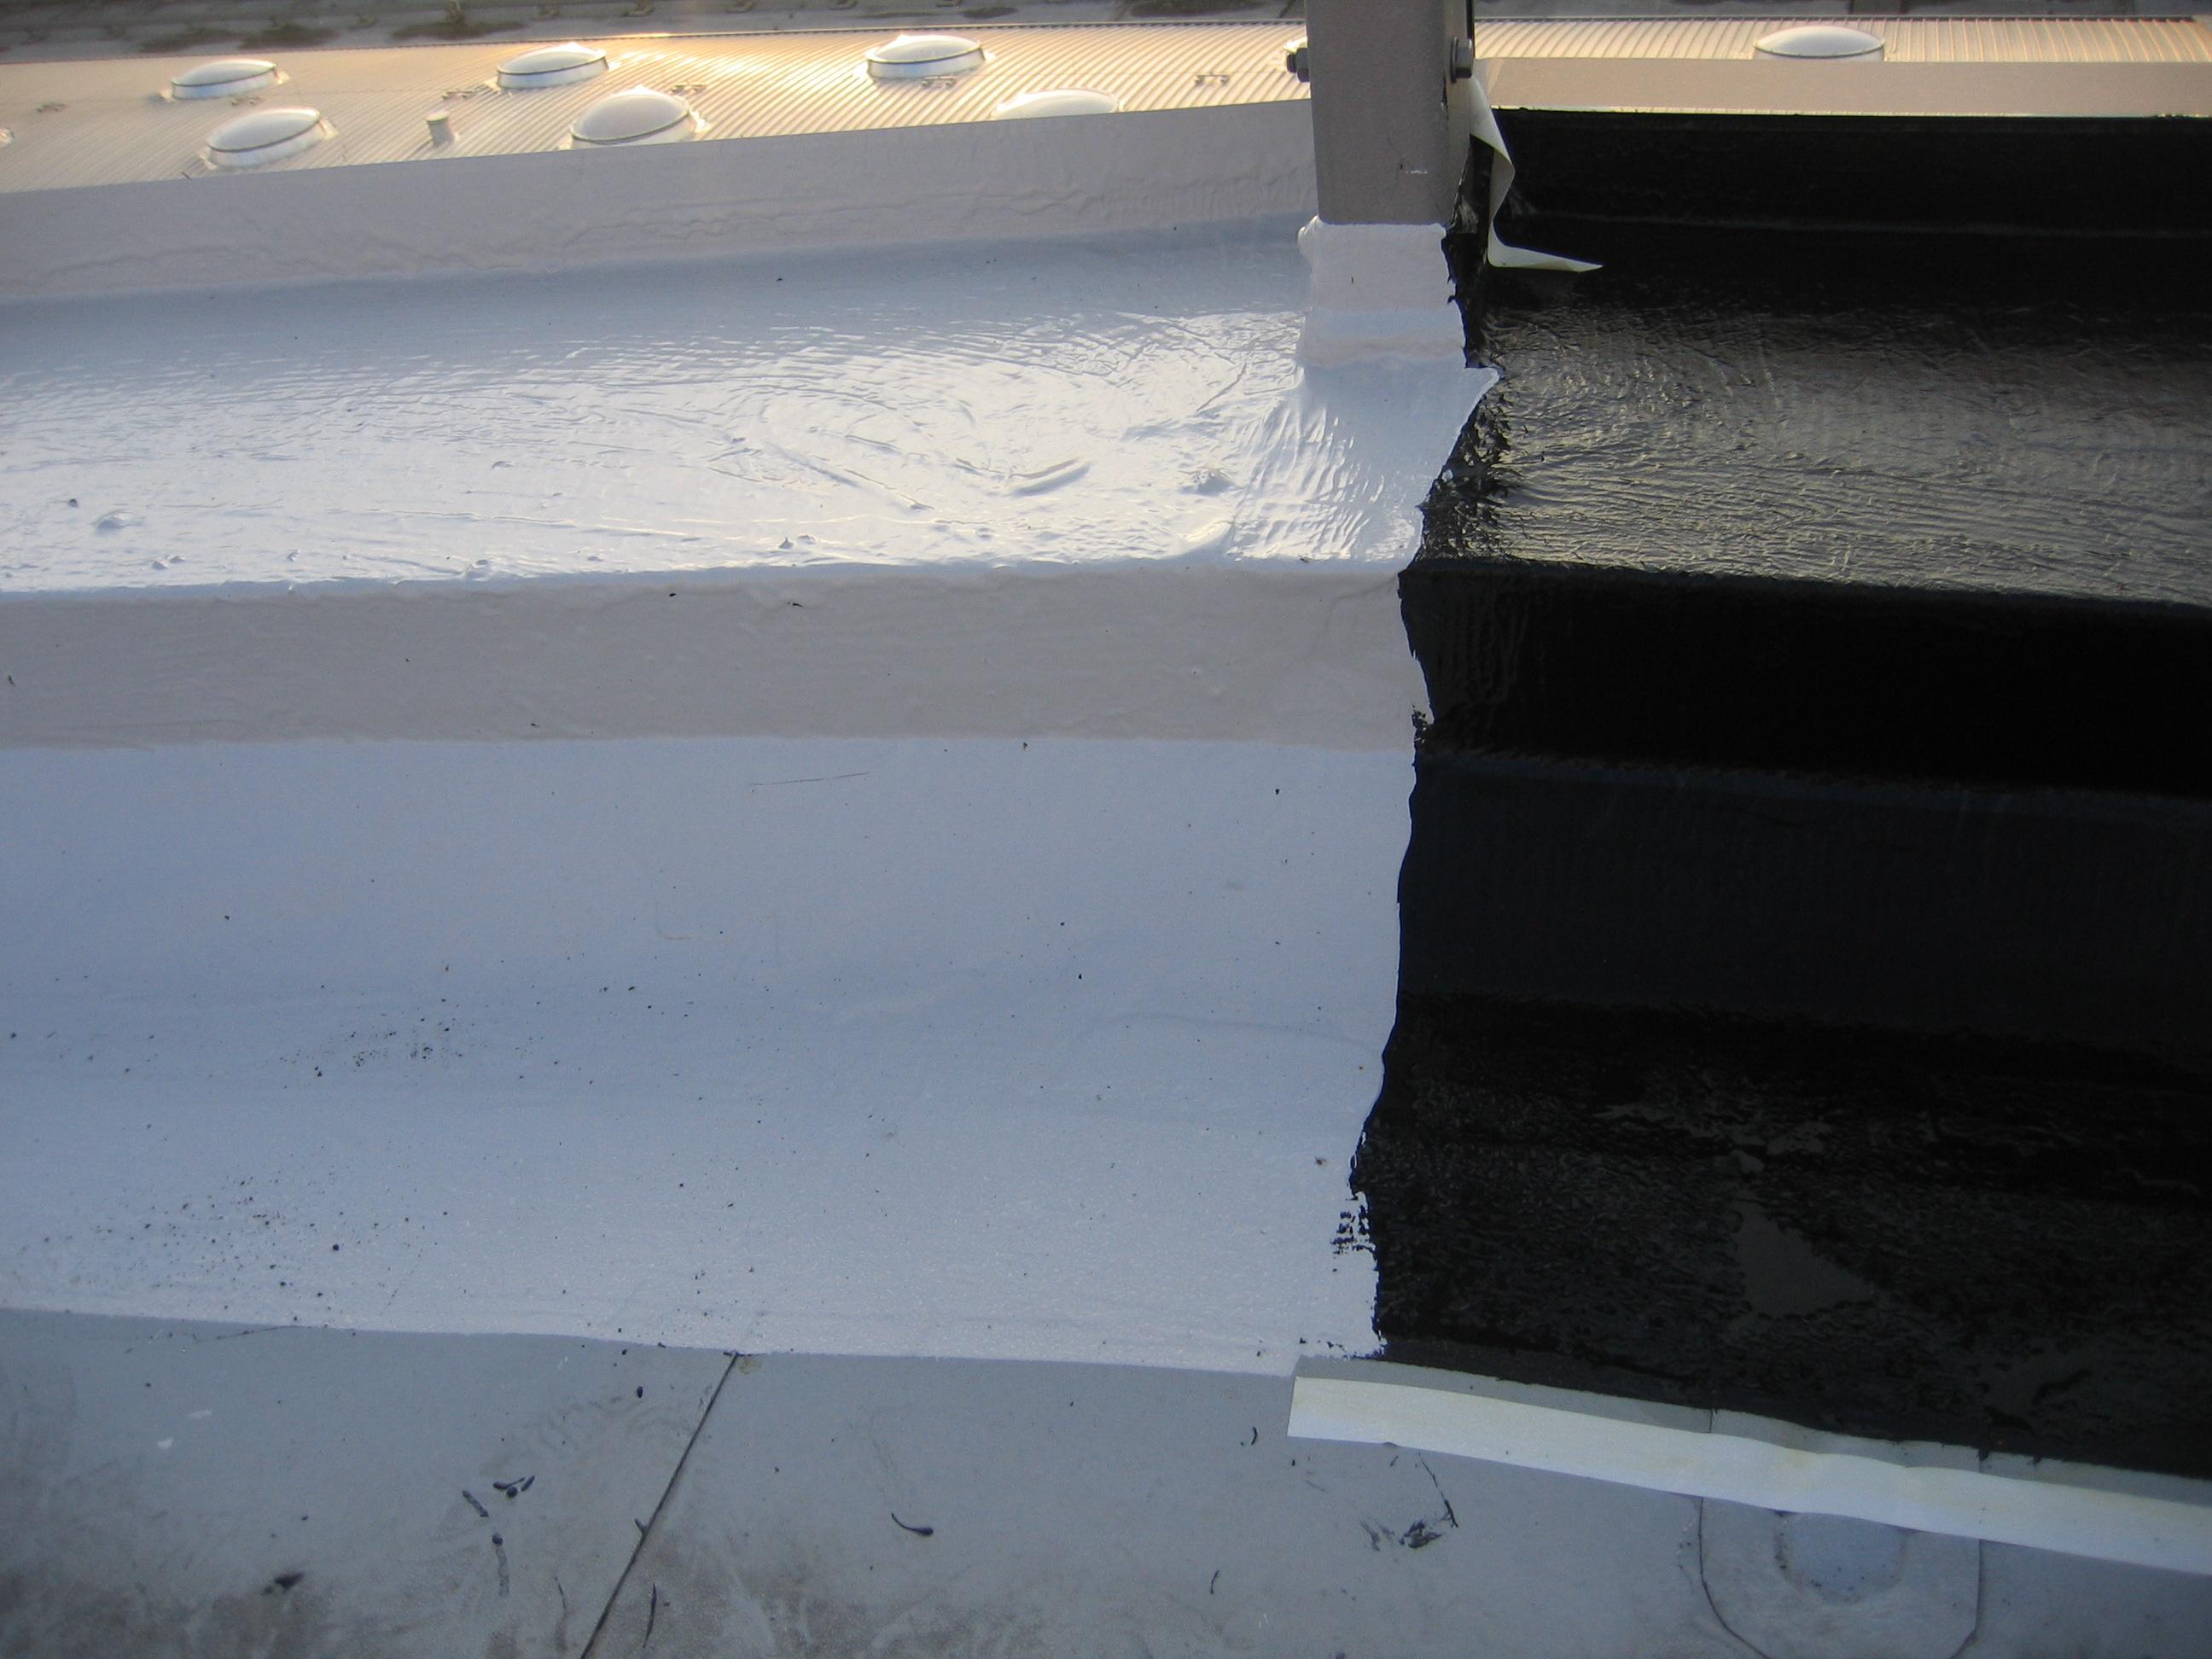 wenn 39 s ums dach geht dachdecker meister holger scheibe sanierung fahrzeugturm mit. Black Bedroom Furniture Sets. Home Design Ideas